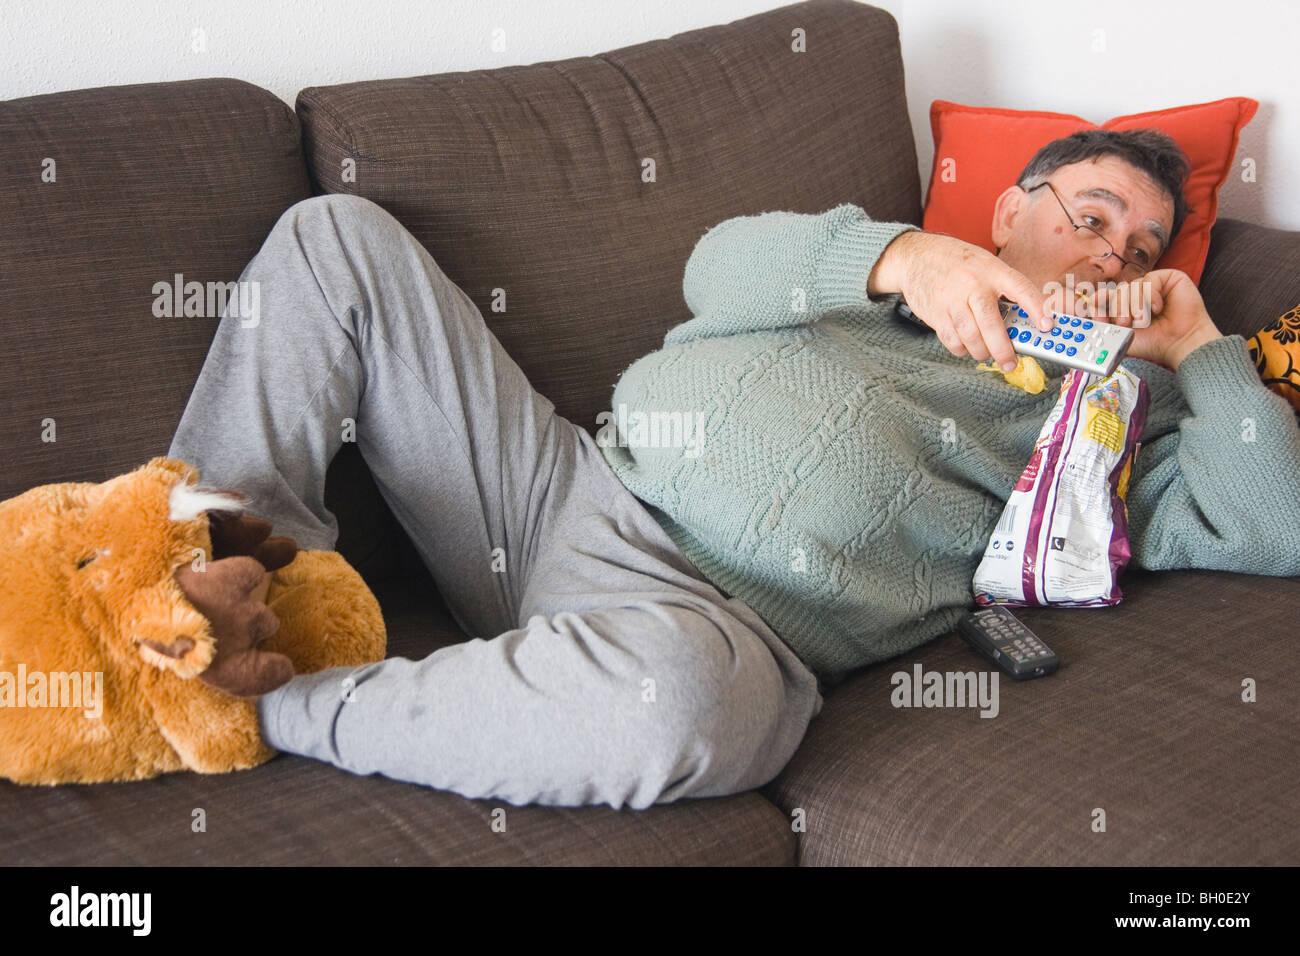 Couch potato Stock Photo 27670579  Alamy